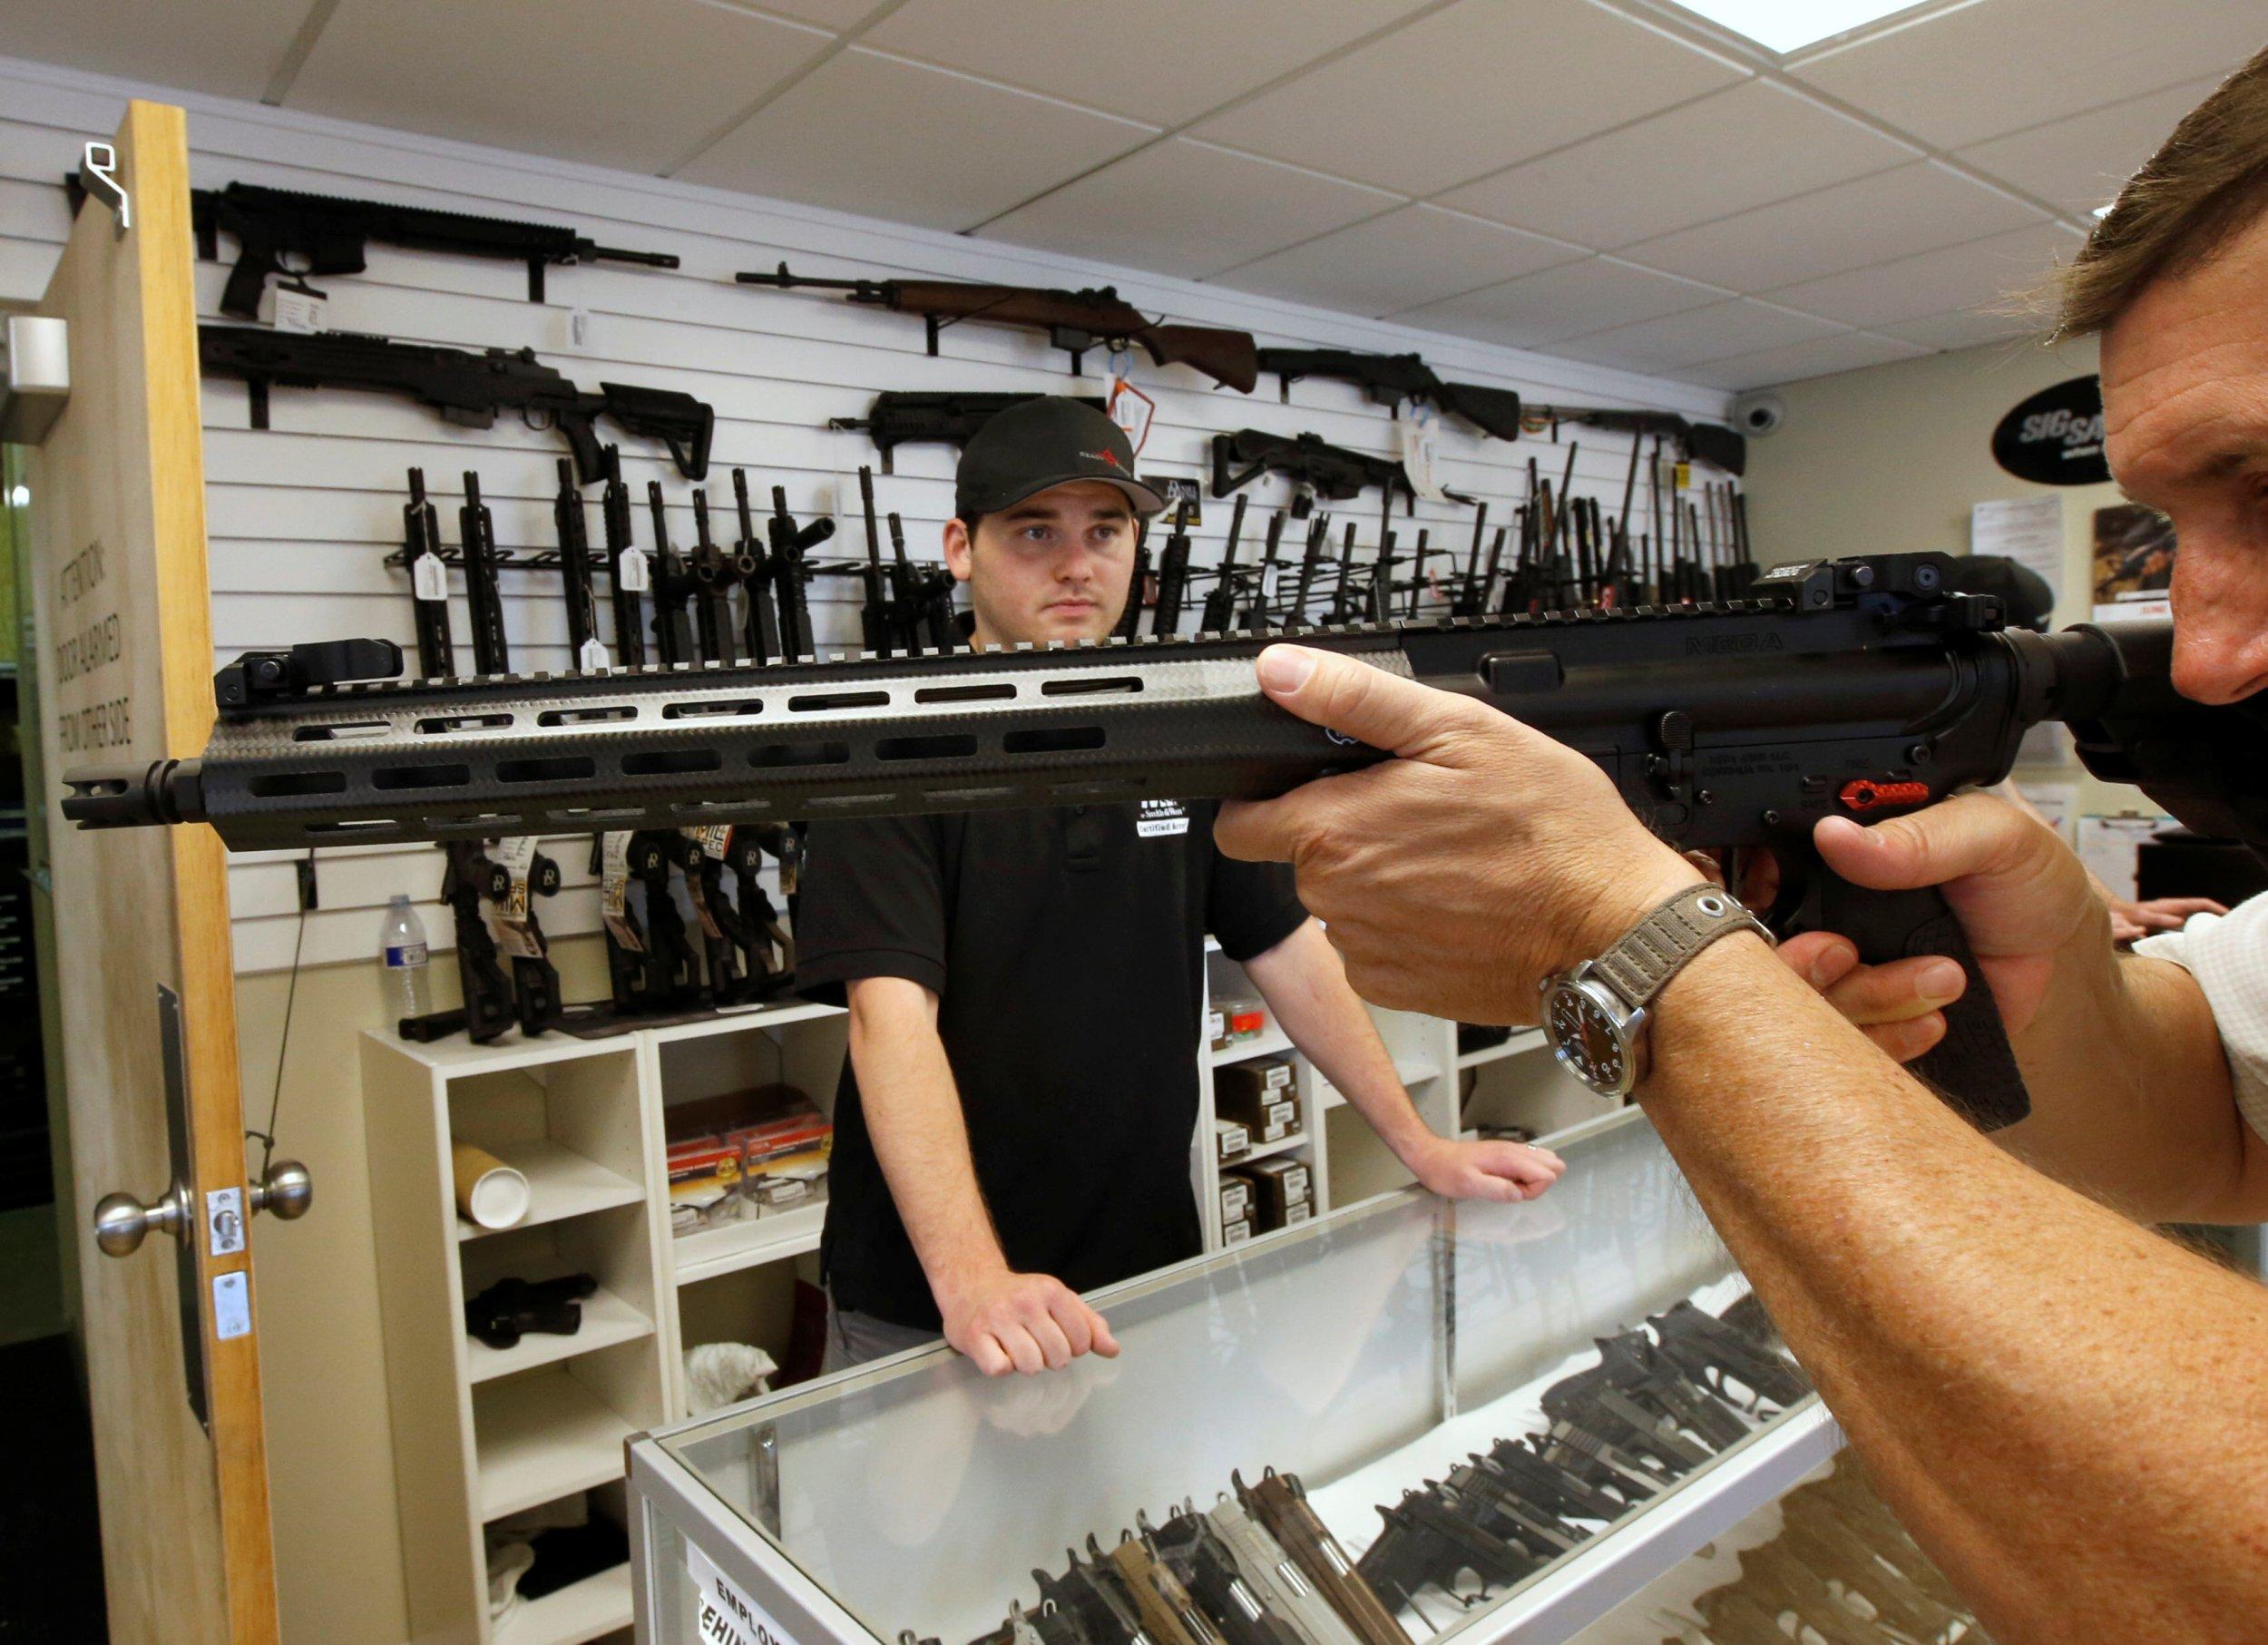 Trump Overturns A Mental Health Regulation On Gun Purchases